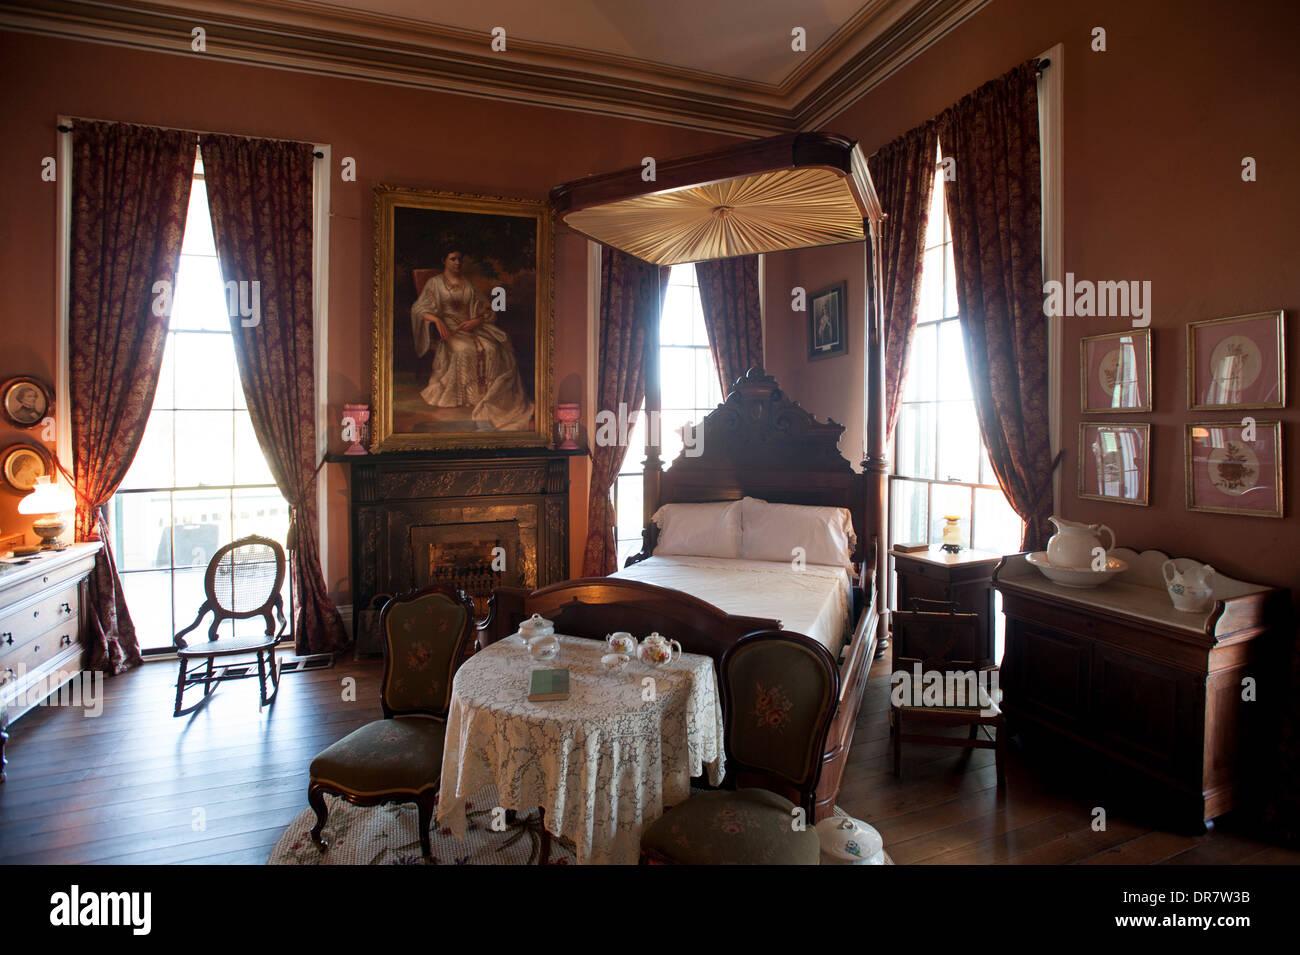 USA Mississippi MS Biloxi Interior Of Home Of Jefferson Davis President Of  The Confederate States Of America Civil War Bedroom